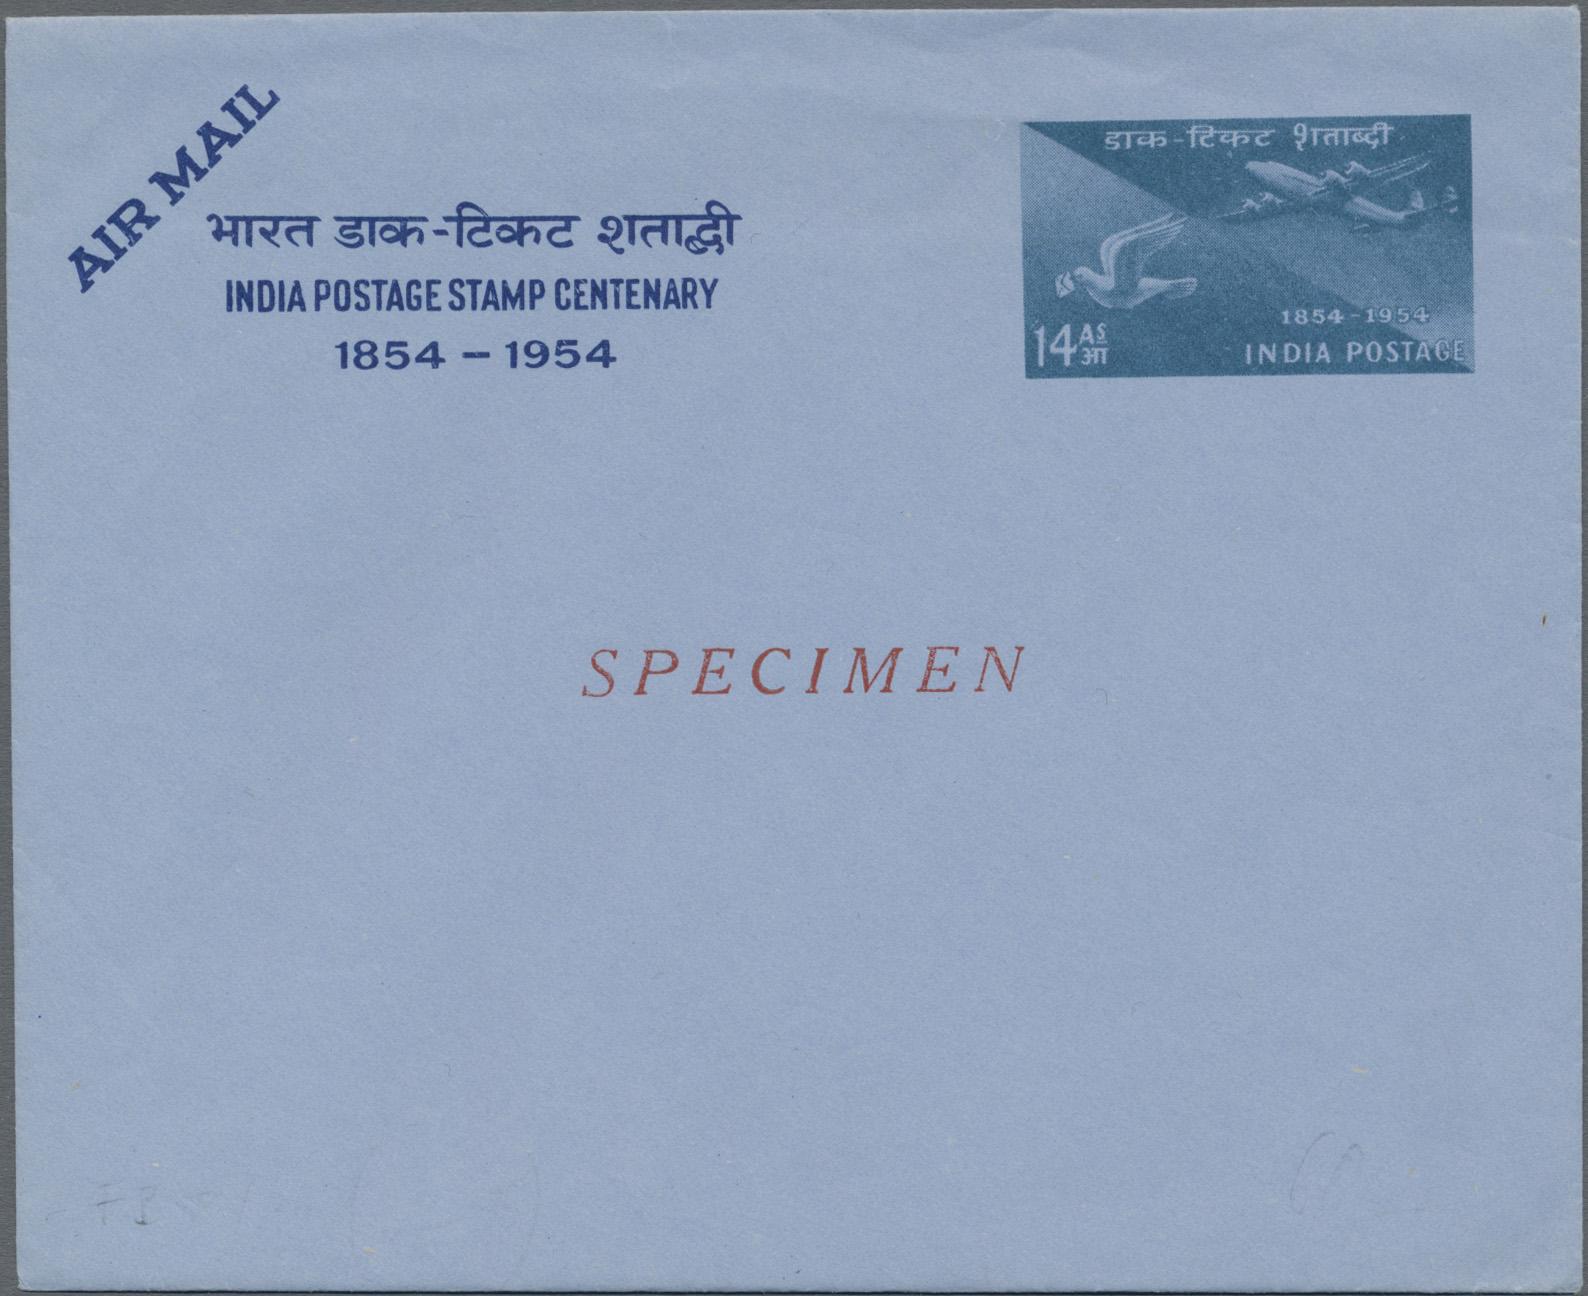 Lot 09499 - Indien - Ganzsachen  -  Auktionshaus Christoph Gärtner GmbH & Co. KG 51th Auction - Day 4